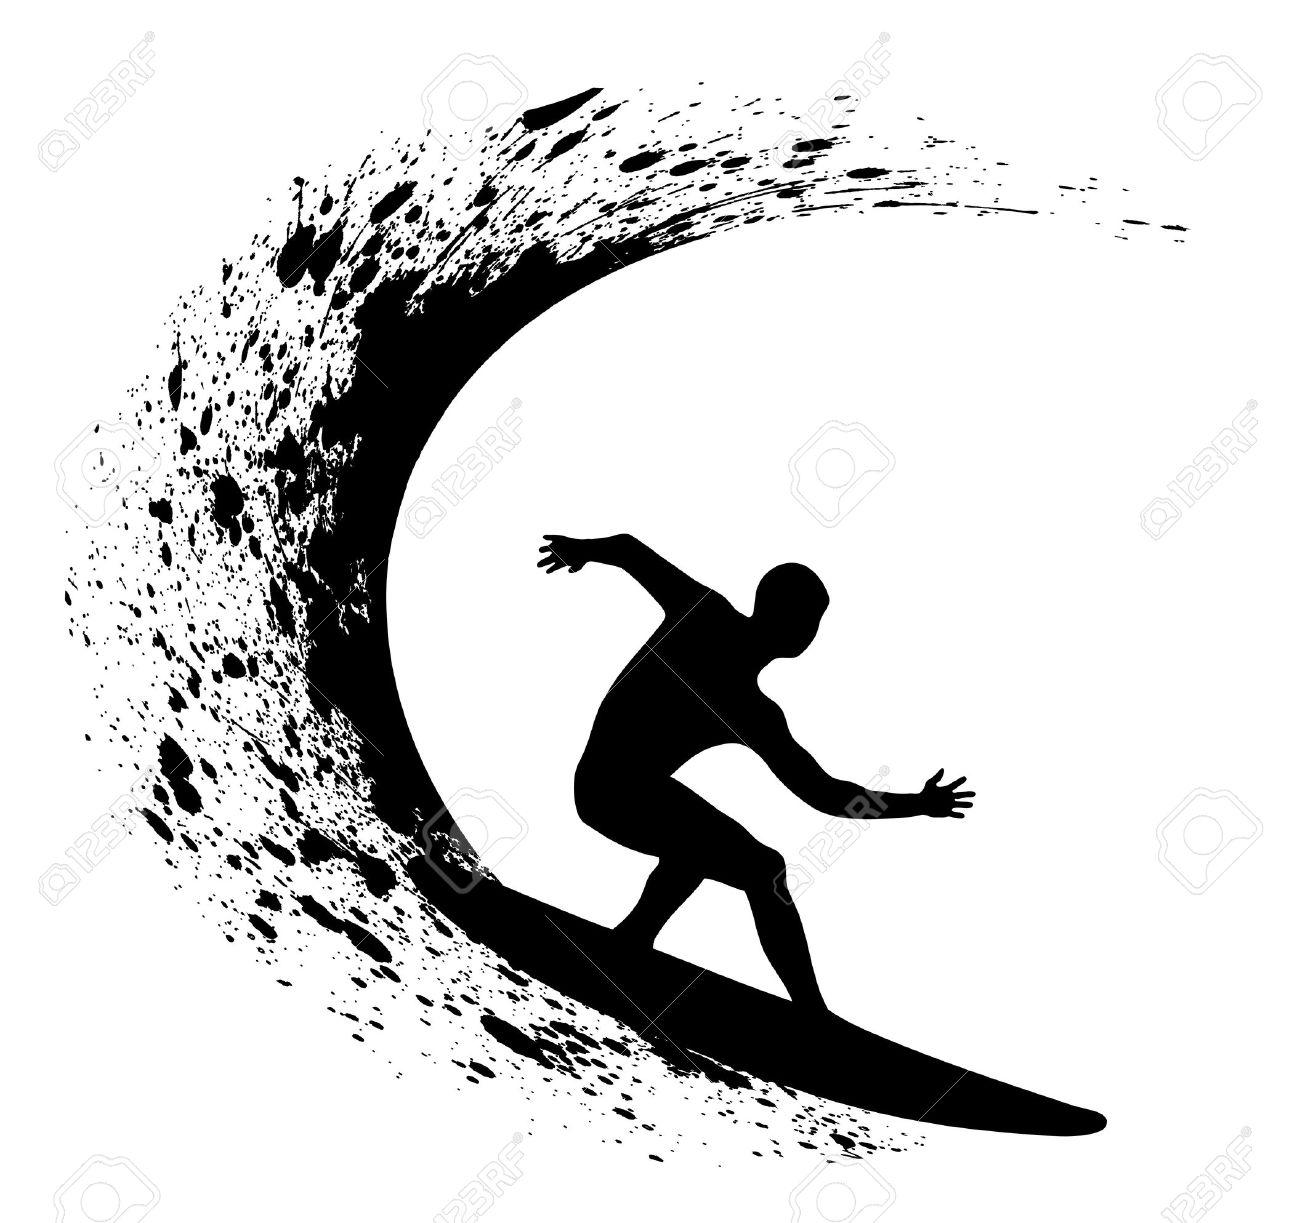 Silhouette boy surfboard clipart clipart transparent download Silhouette boy surfboard clipart - ClipartFest clipart transparent download